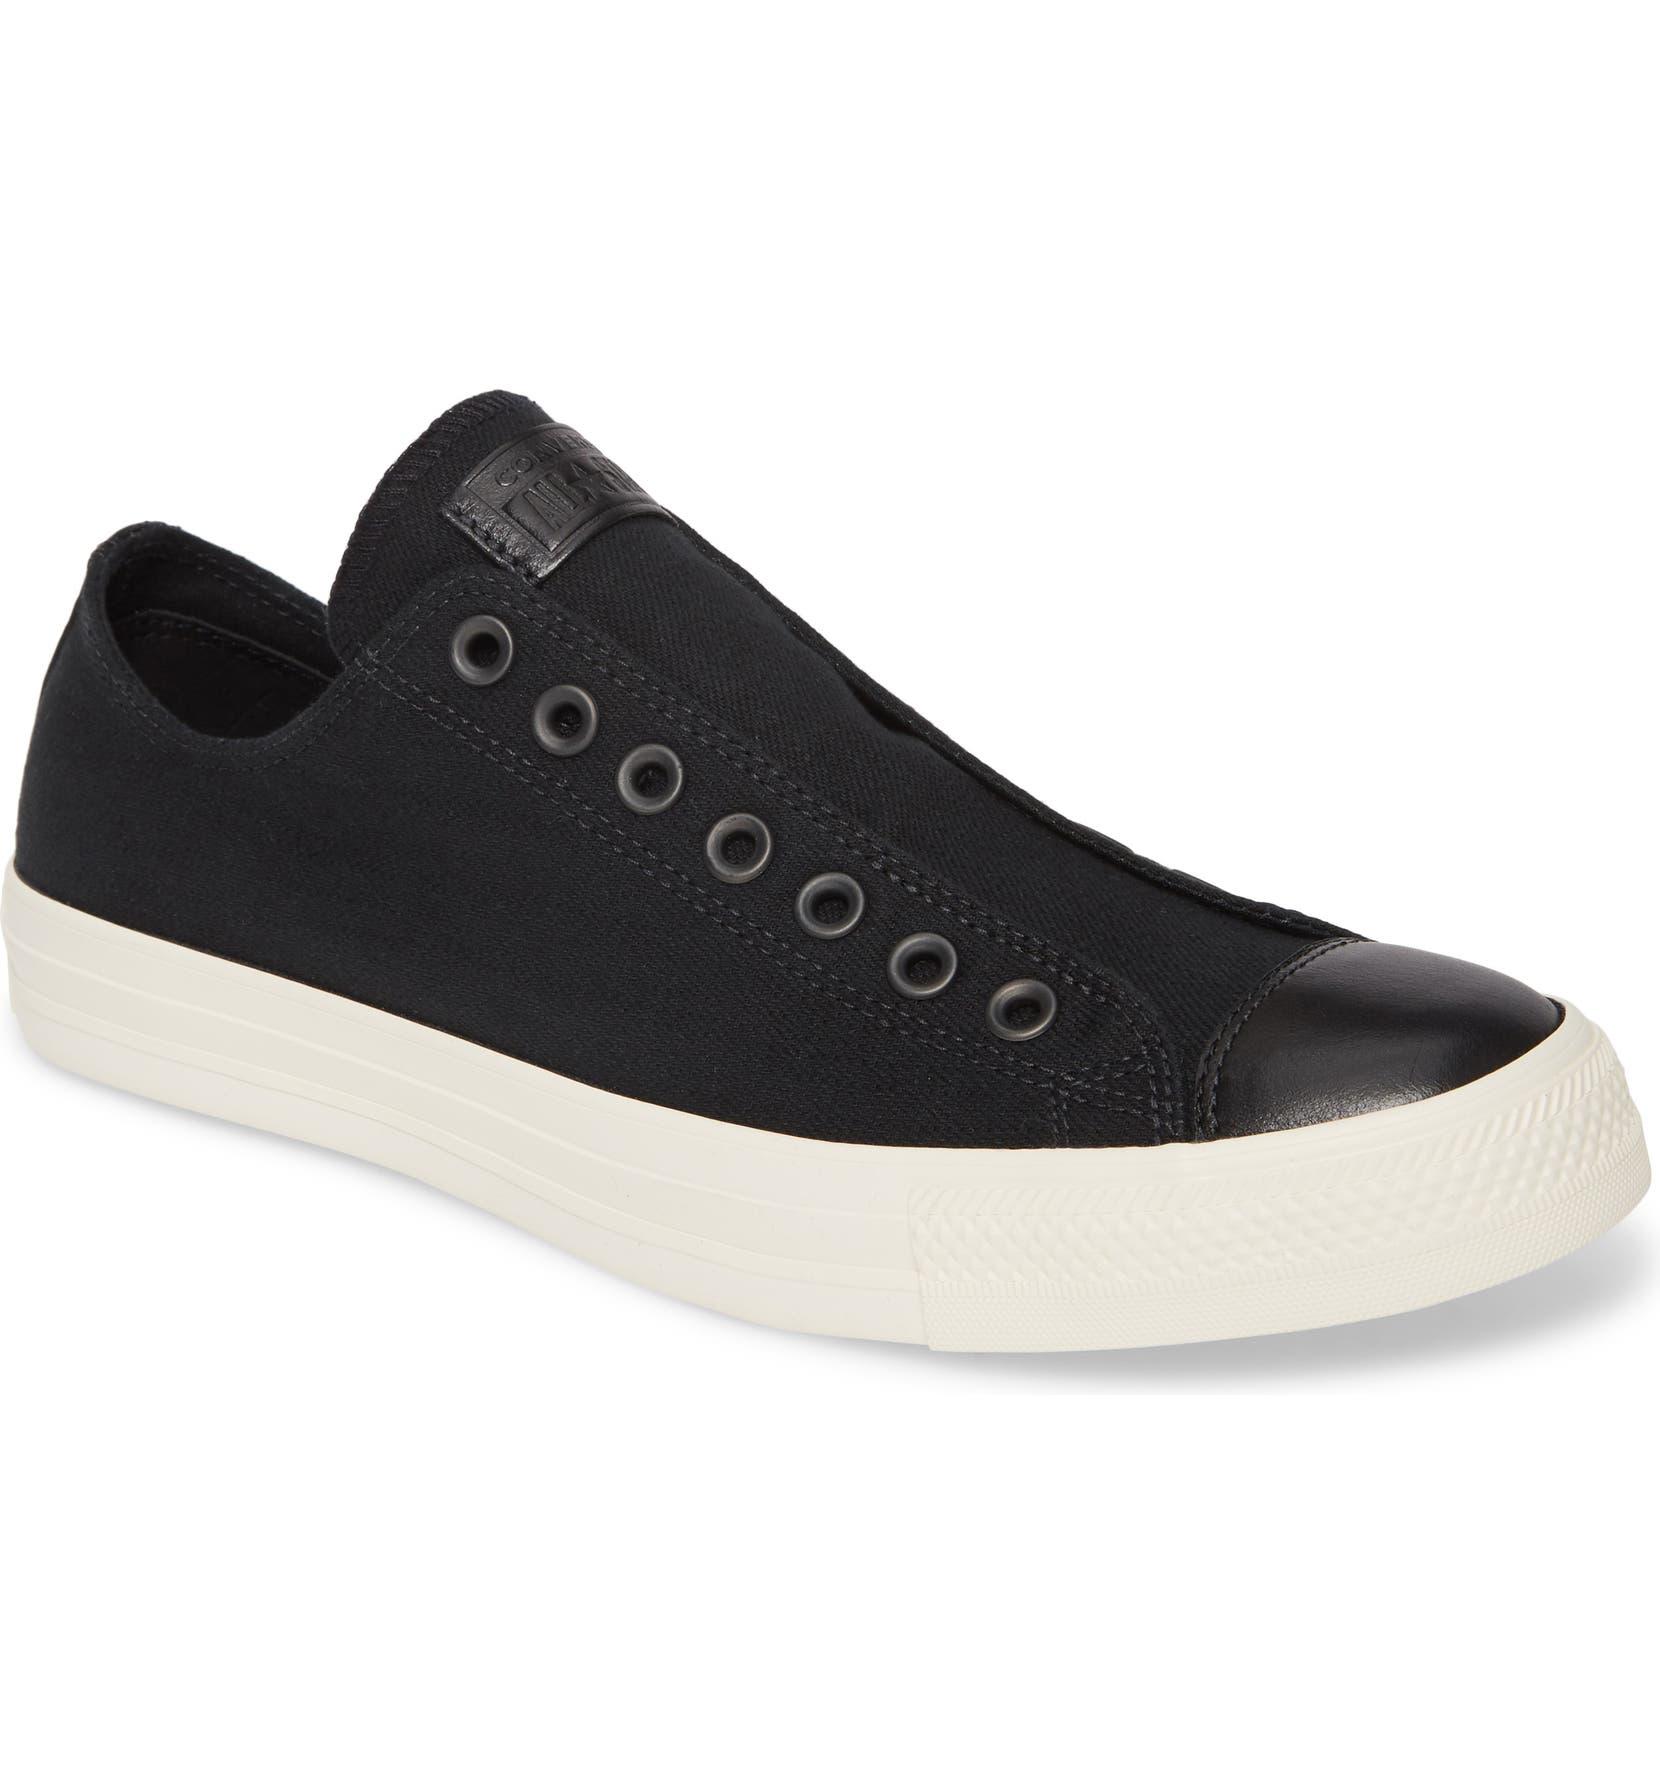 Top Value Sneakers Converse Chuck Taylor All Star Hi Top